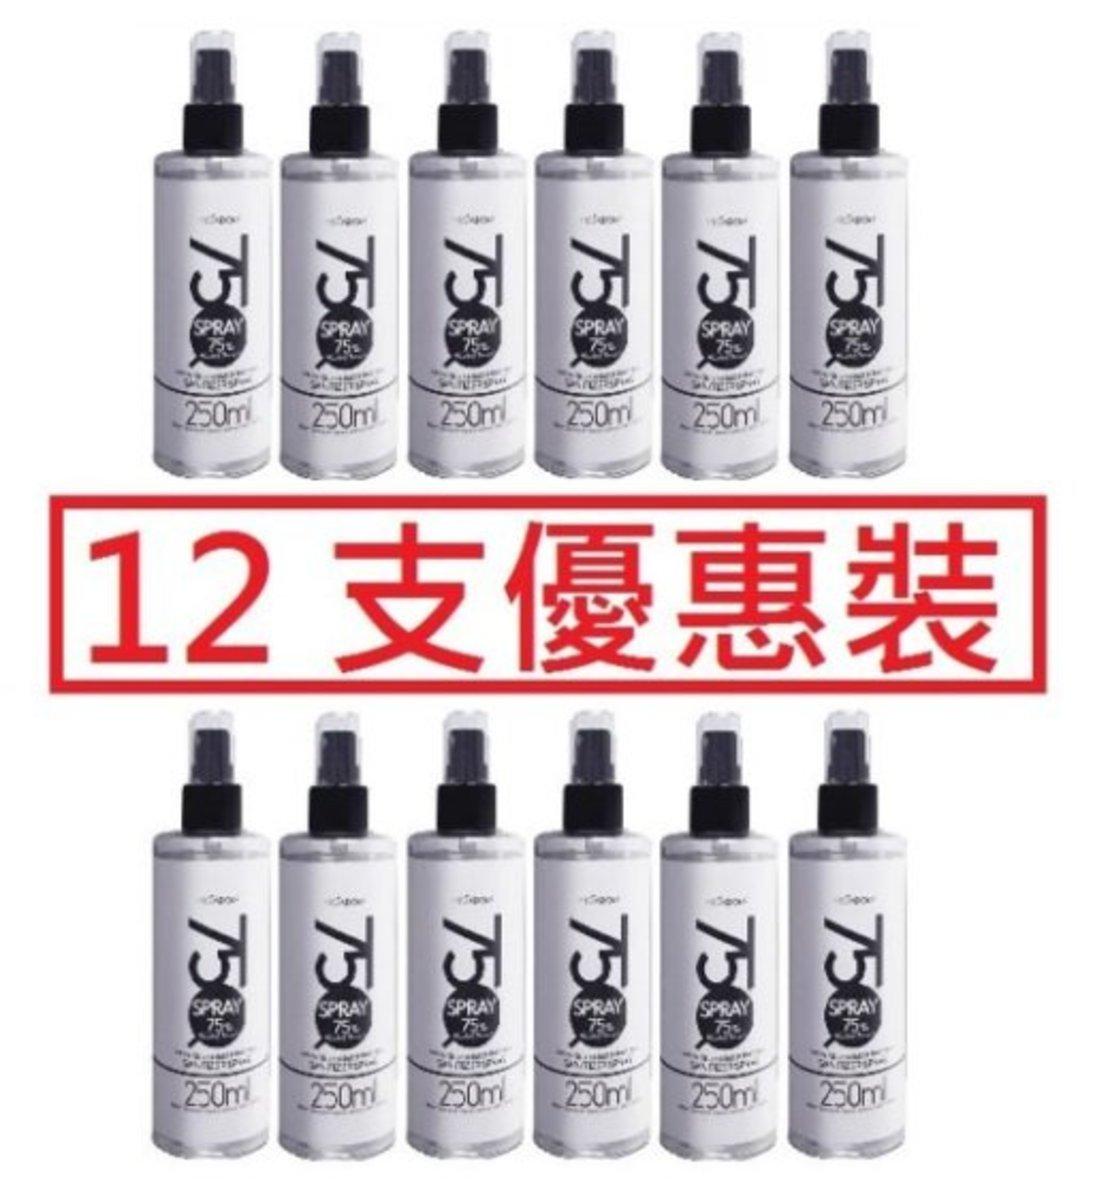 (x12)MoiAdore 75Q  (250ml) 75% 酒精 消毒殺菌噴霧